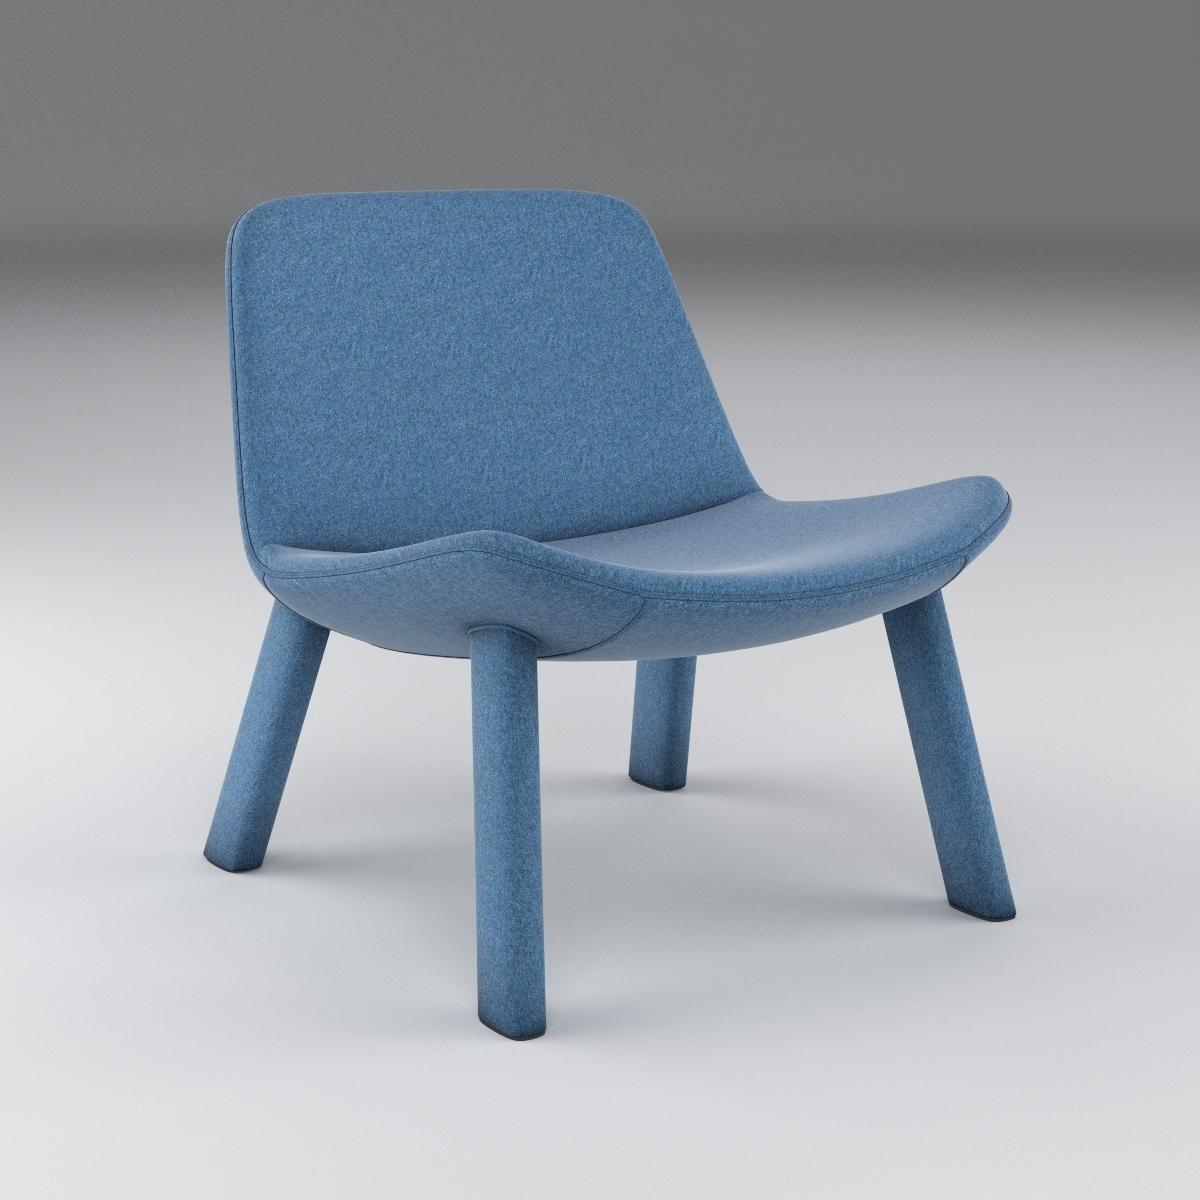 Phenomenal Neat Lounge Chair By Blu Dot Ibusinesslaw Wood Chair Design Ideas Ibusinesslaworg